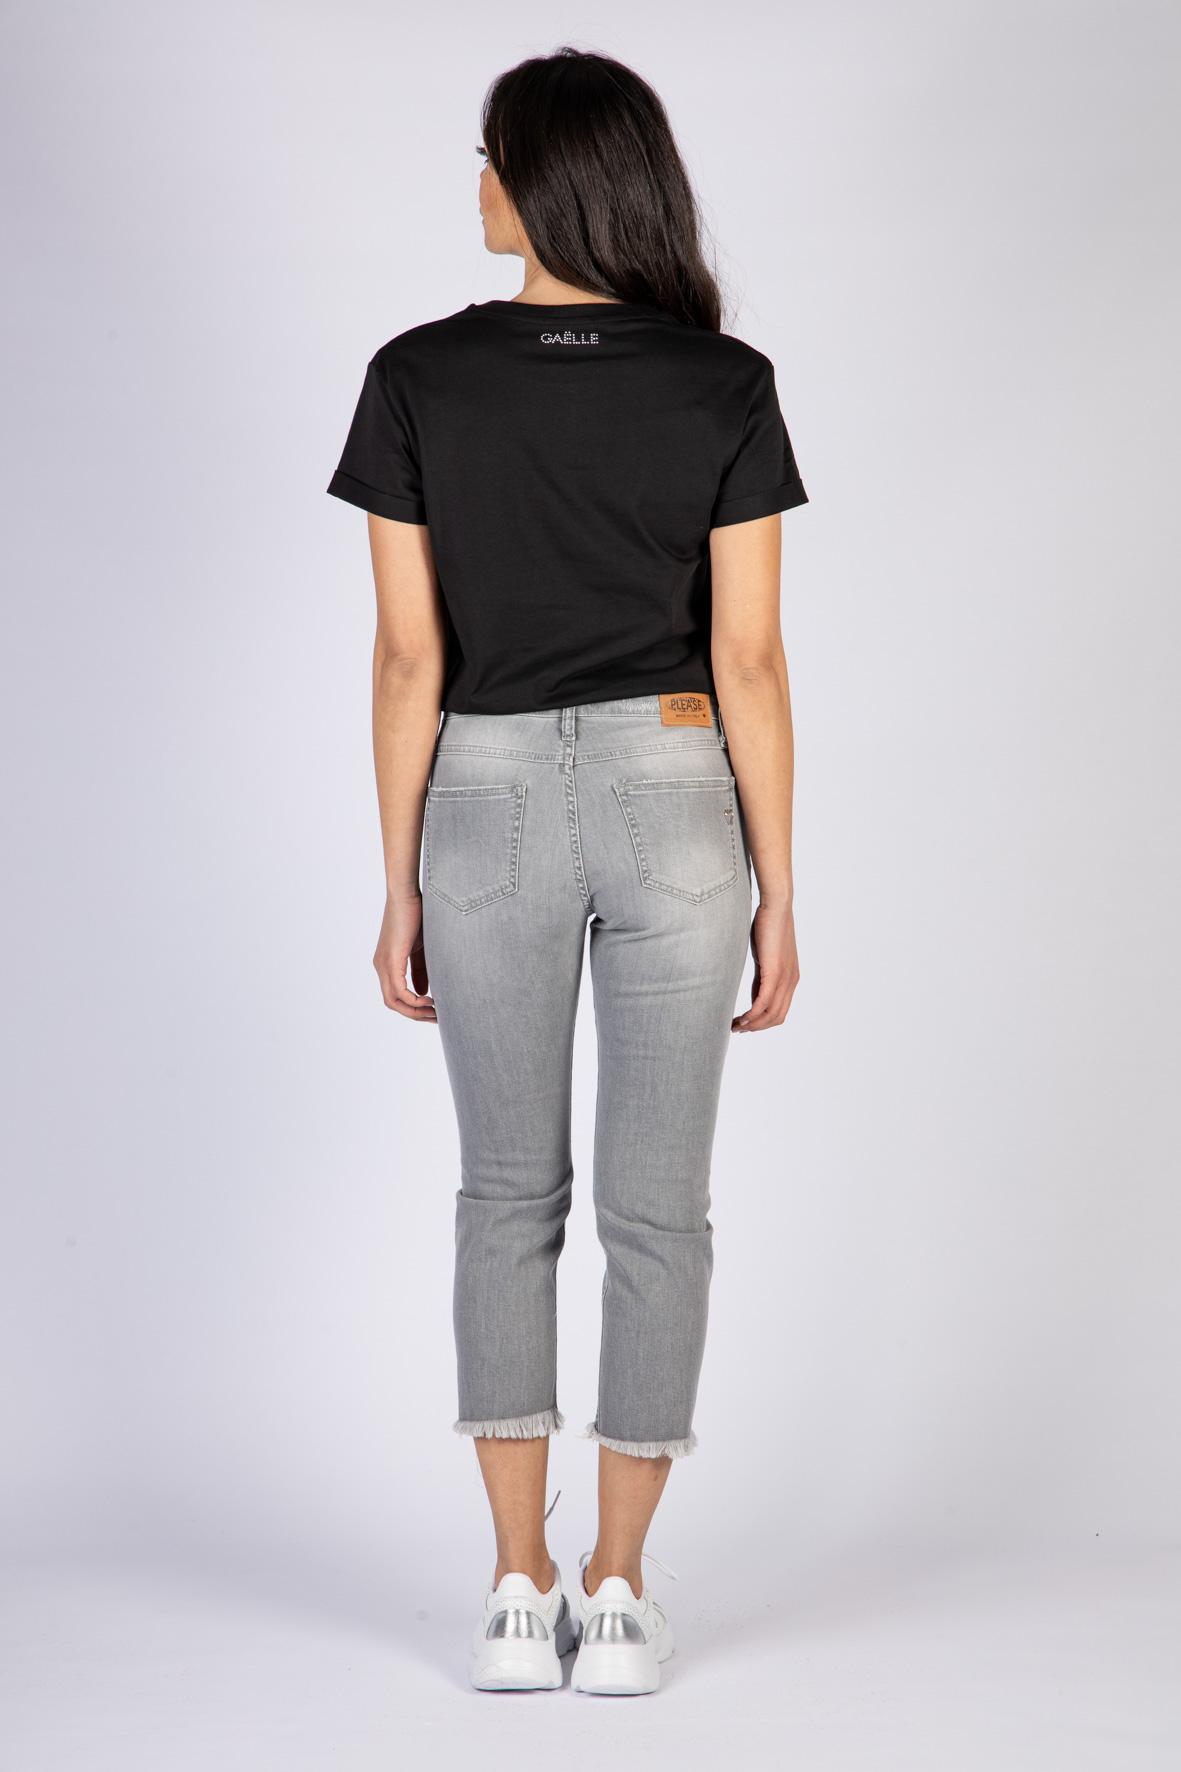 T-SHIRT IN JERSEY GAELLE | T-shirt | GBD8715NERO